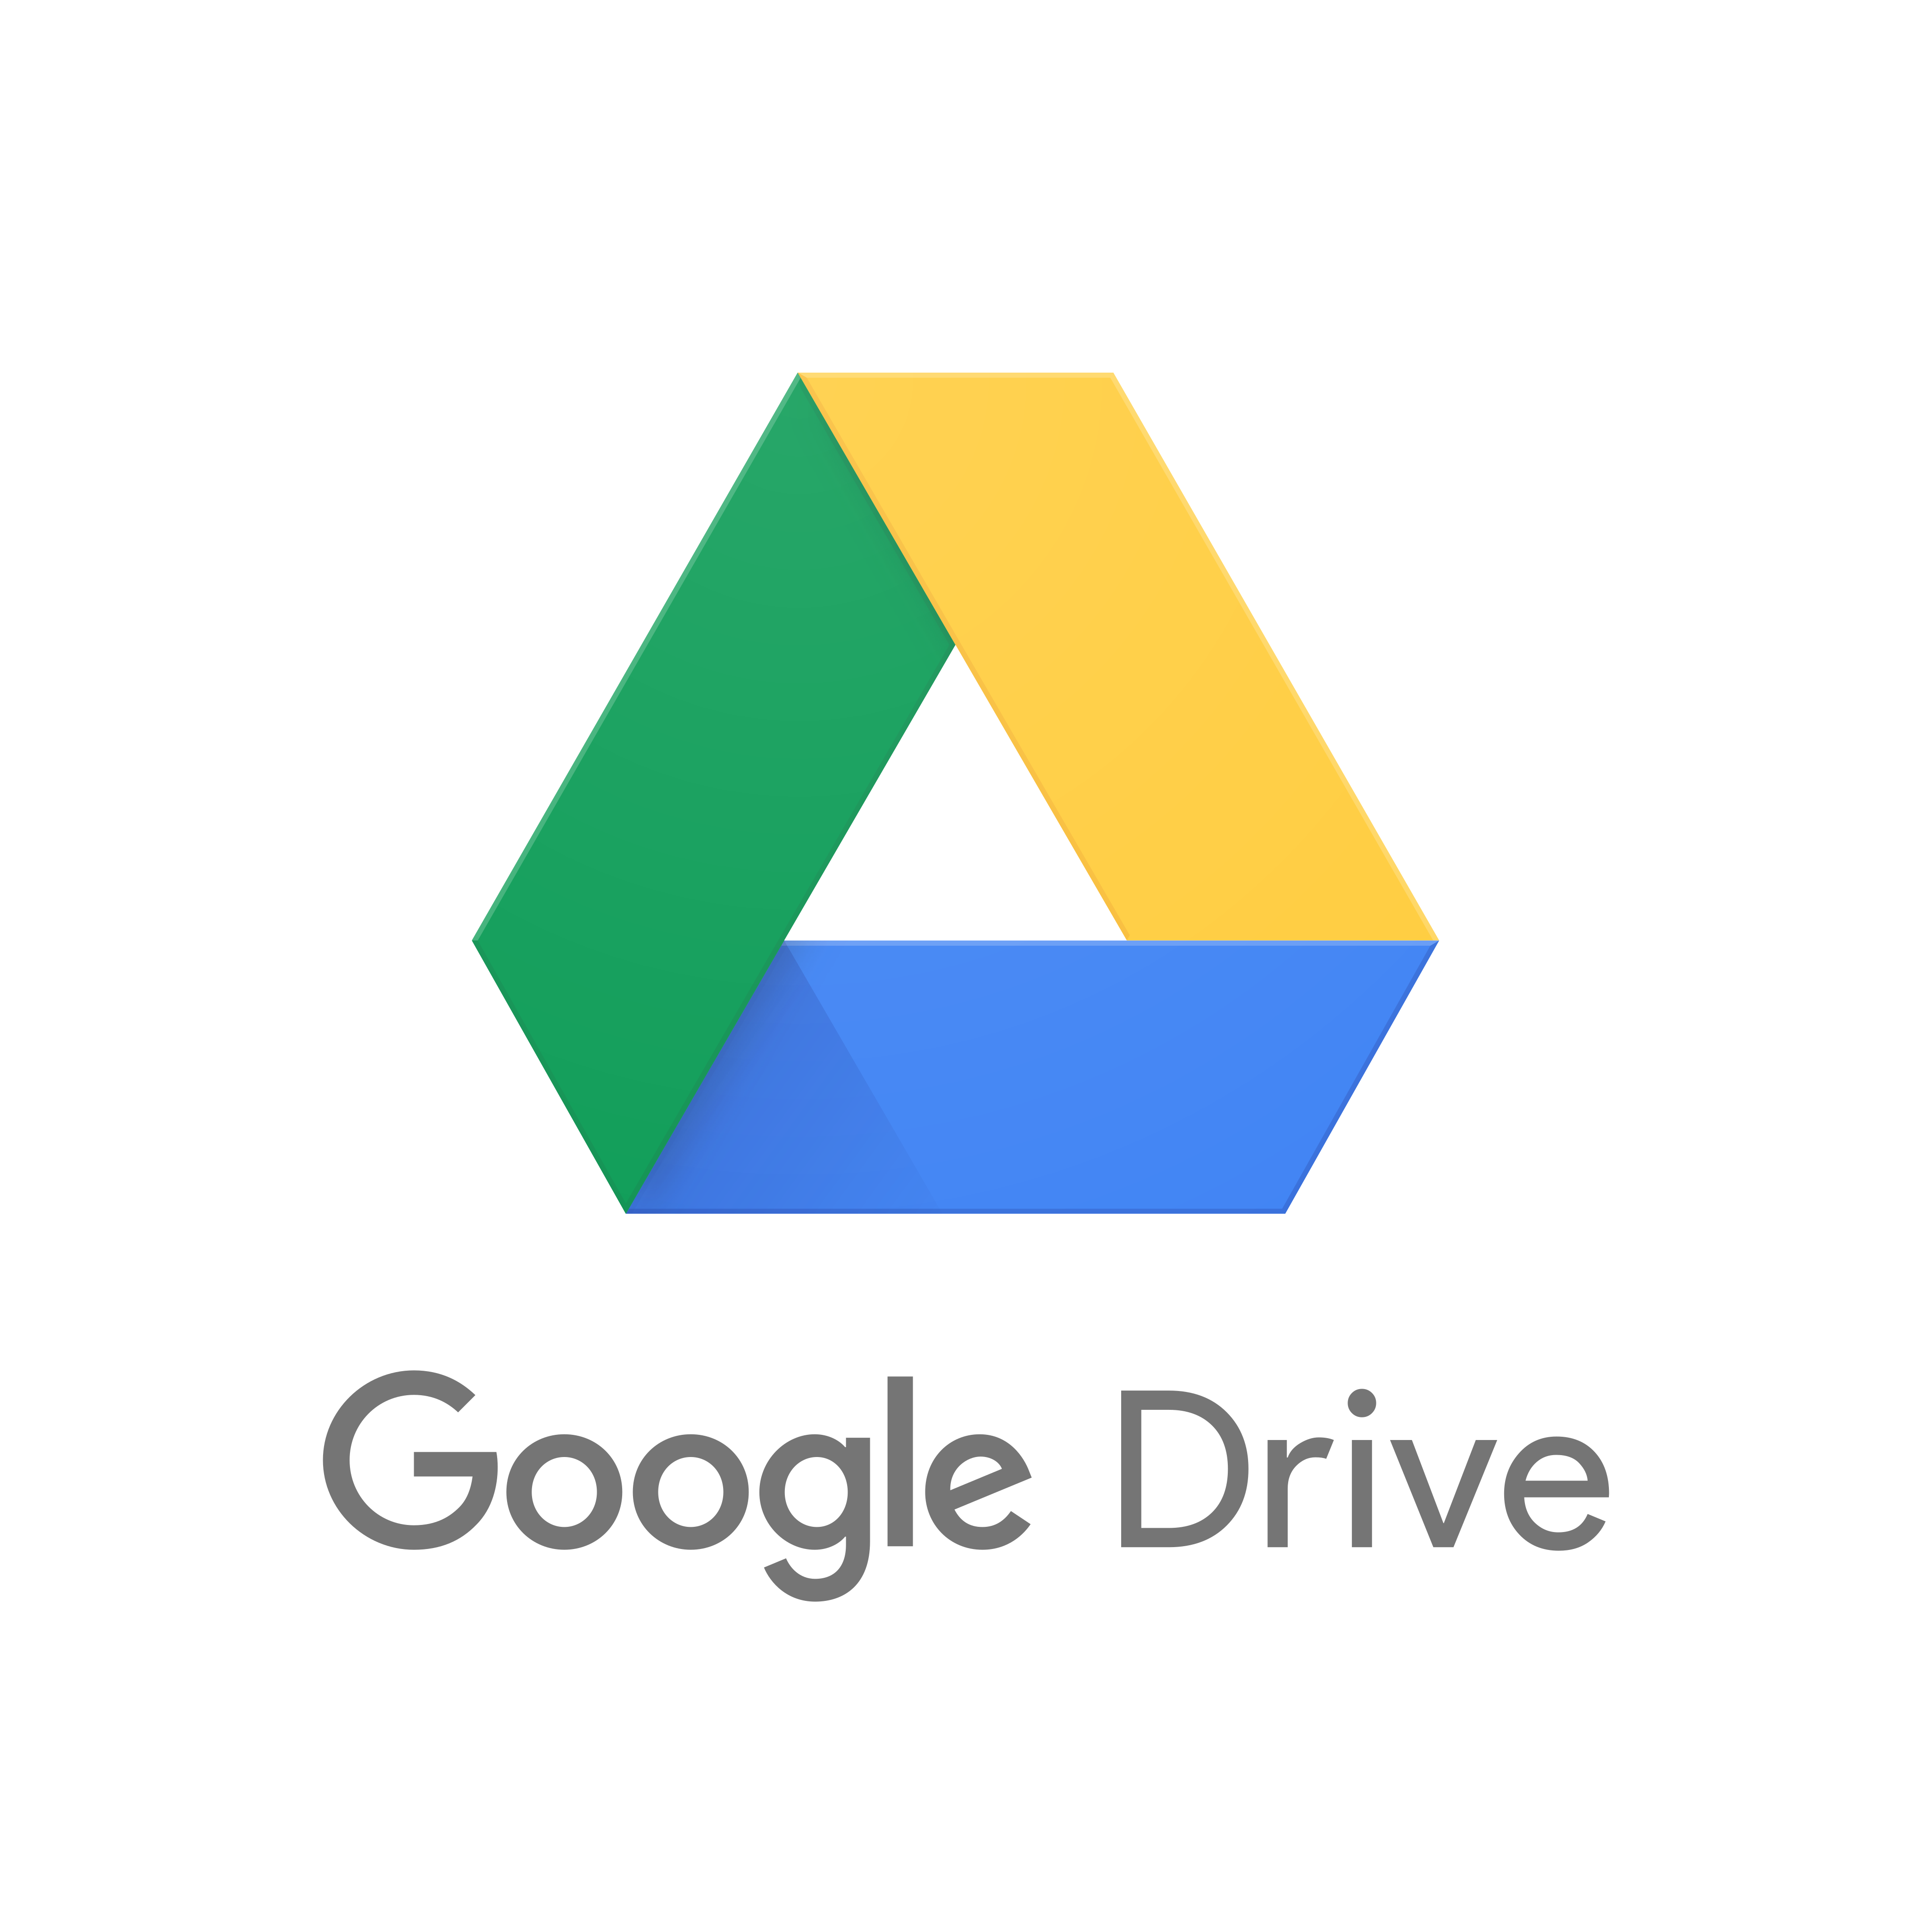 google drive logo 0 - Google Drive Logo